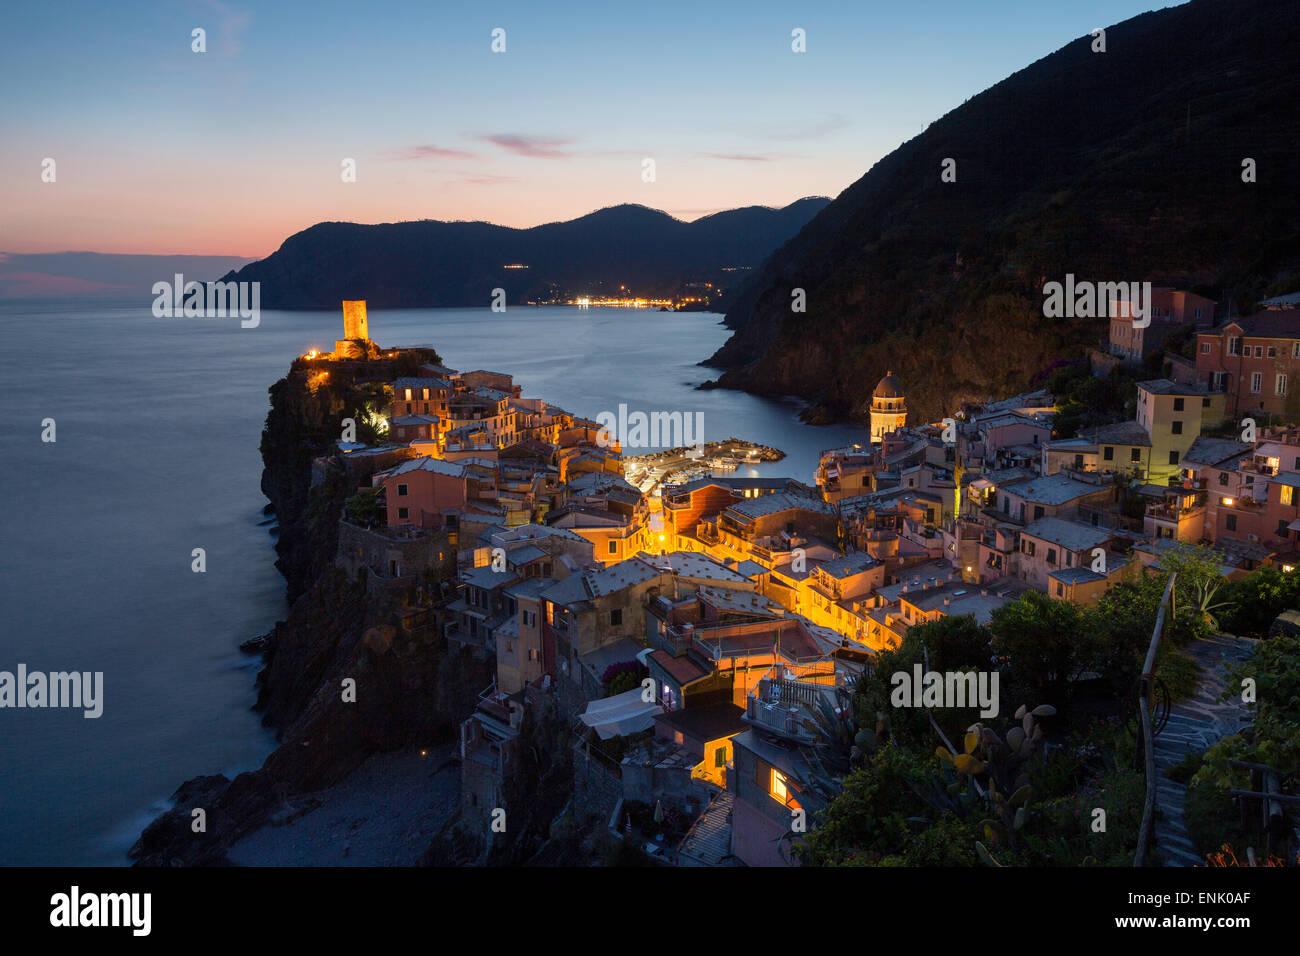 Vernazza in the evening, Cinque Terre, UNESCO World Heritage Site, Liguria, Italy, Europe - Stock Image